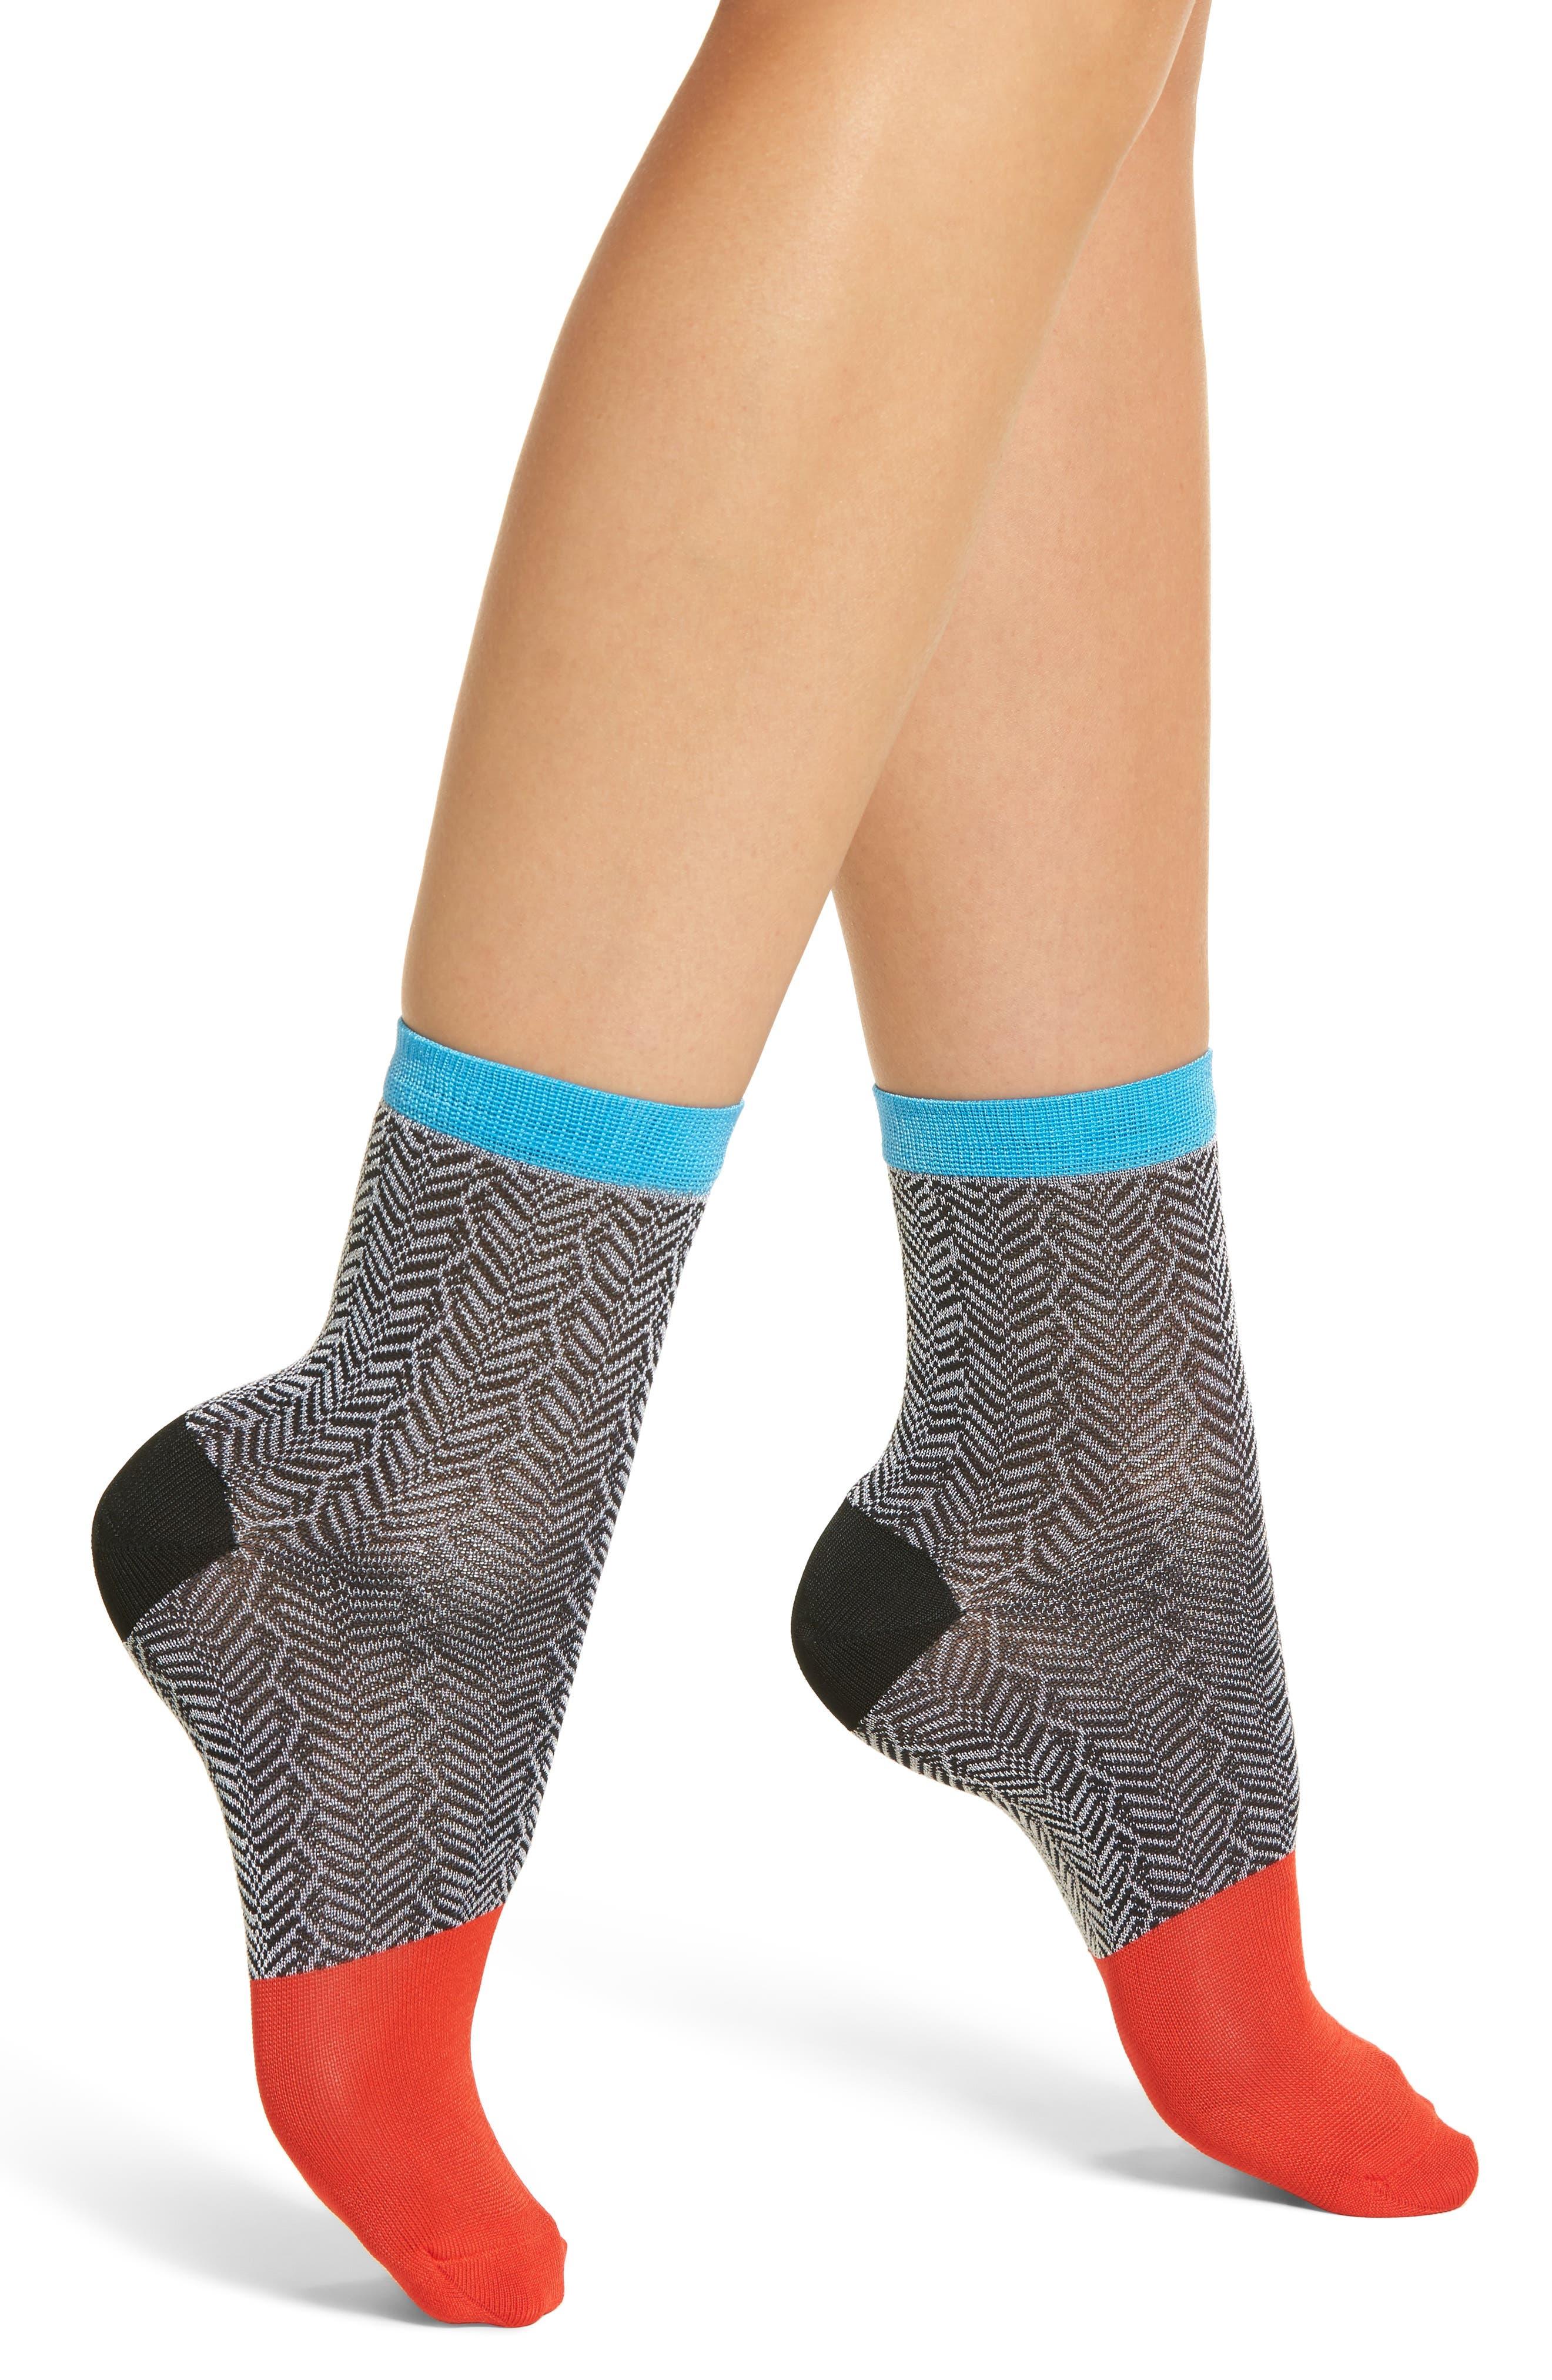 Jill Ankle Socks,                             Main thumbnail 1, color,                             013